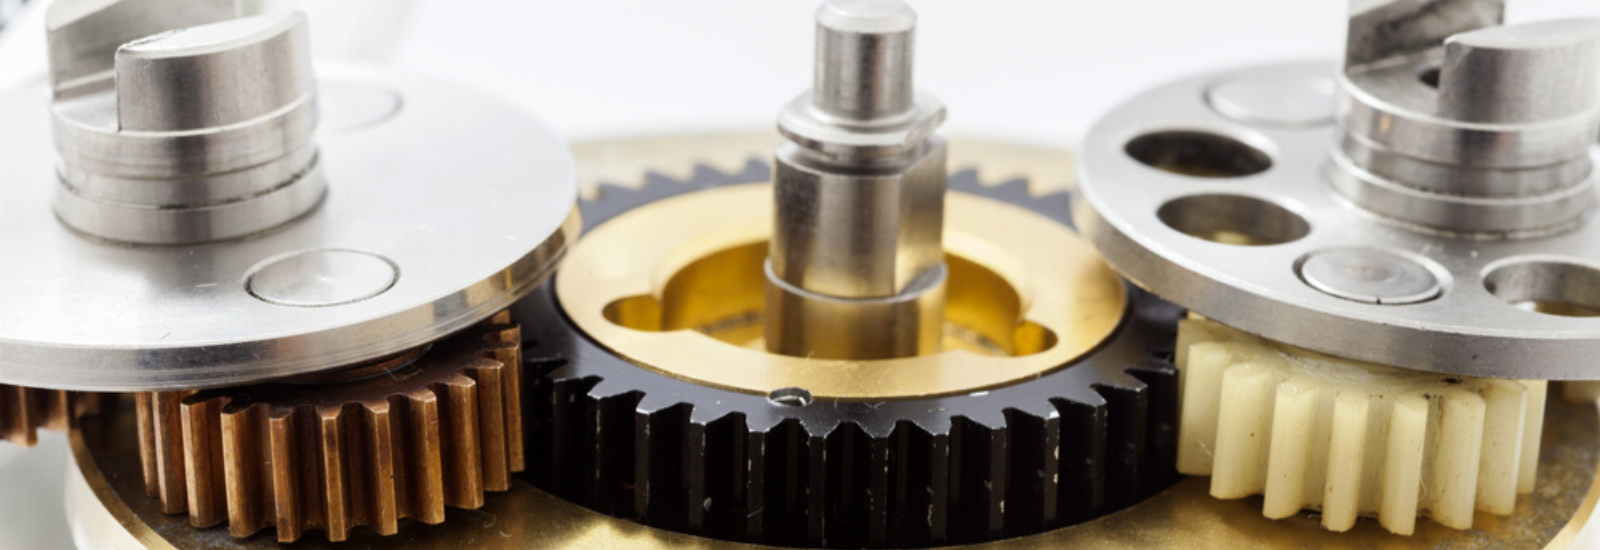 grassi lubrificanti per riduttori epicicloidali macchine distribuzione automatica